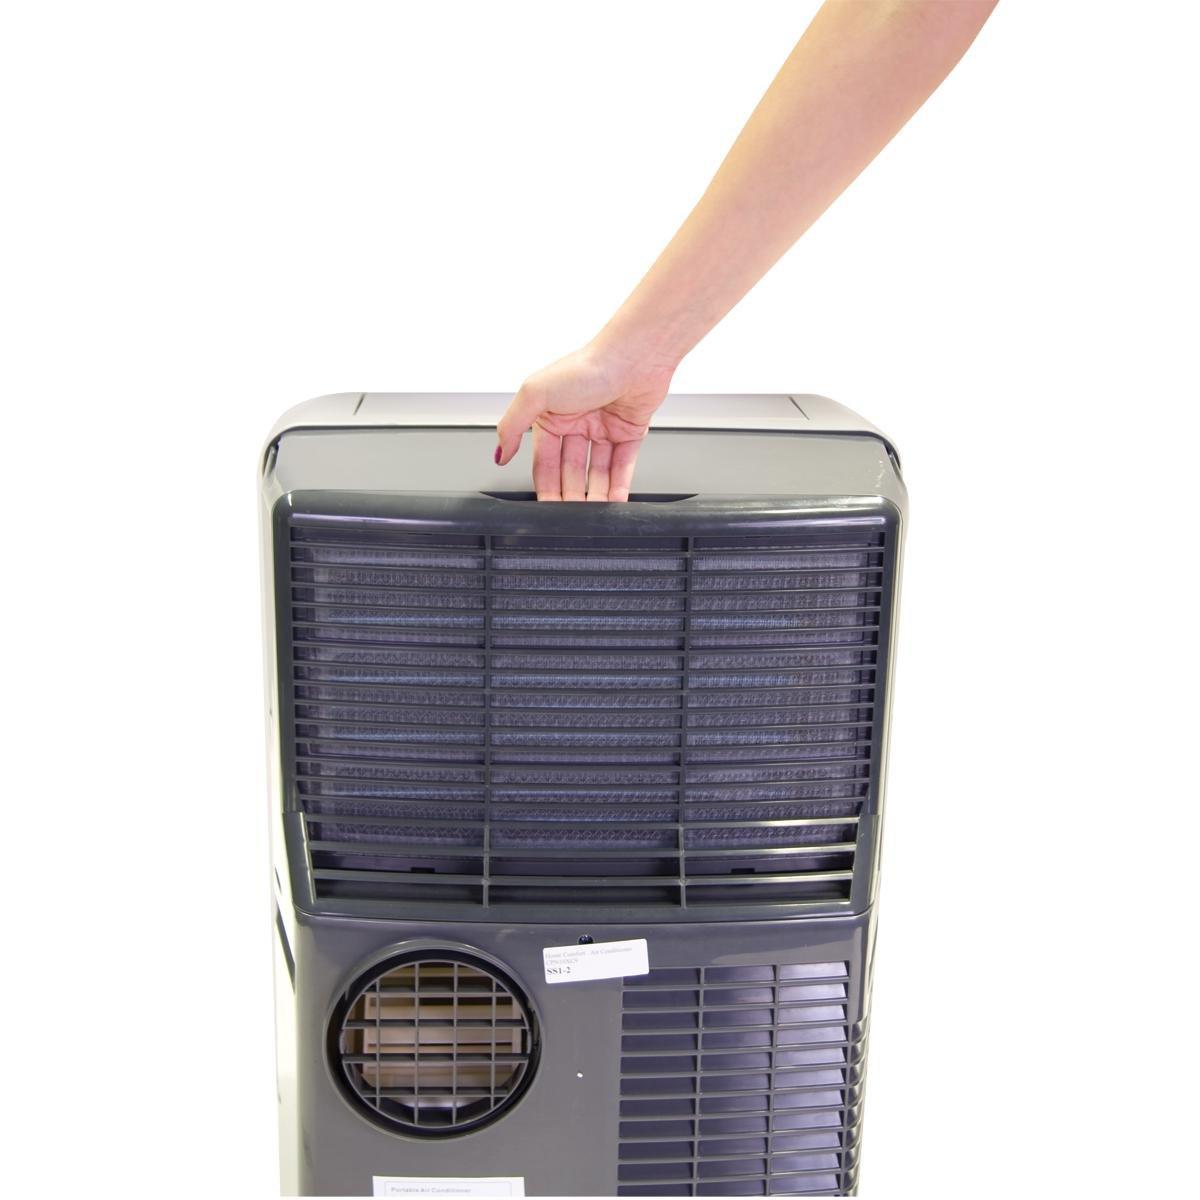 Amazon haier hpn14xhm 14 000 btu portable air conditioner 11 amazon haier hpn14xhm 14 000 btu portable air conditioner 11 000 btu portable heater combo unit home kitchen fandeluxe Image collections